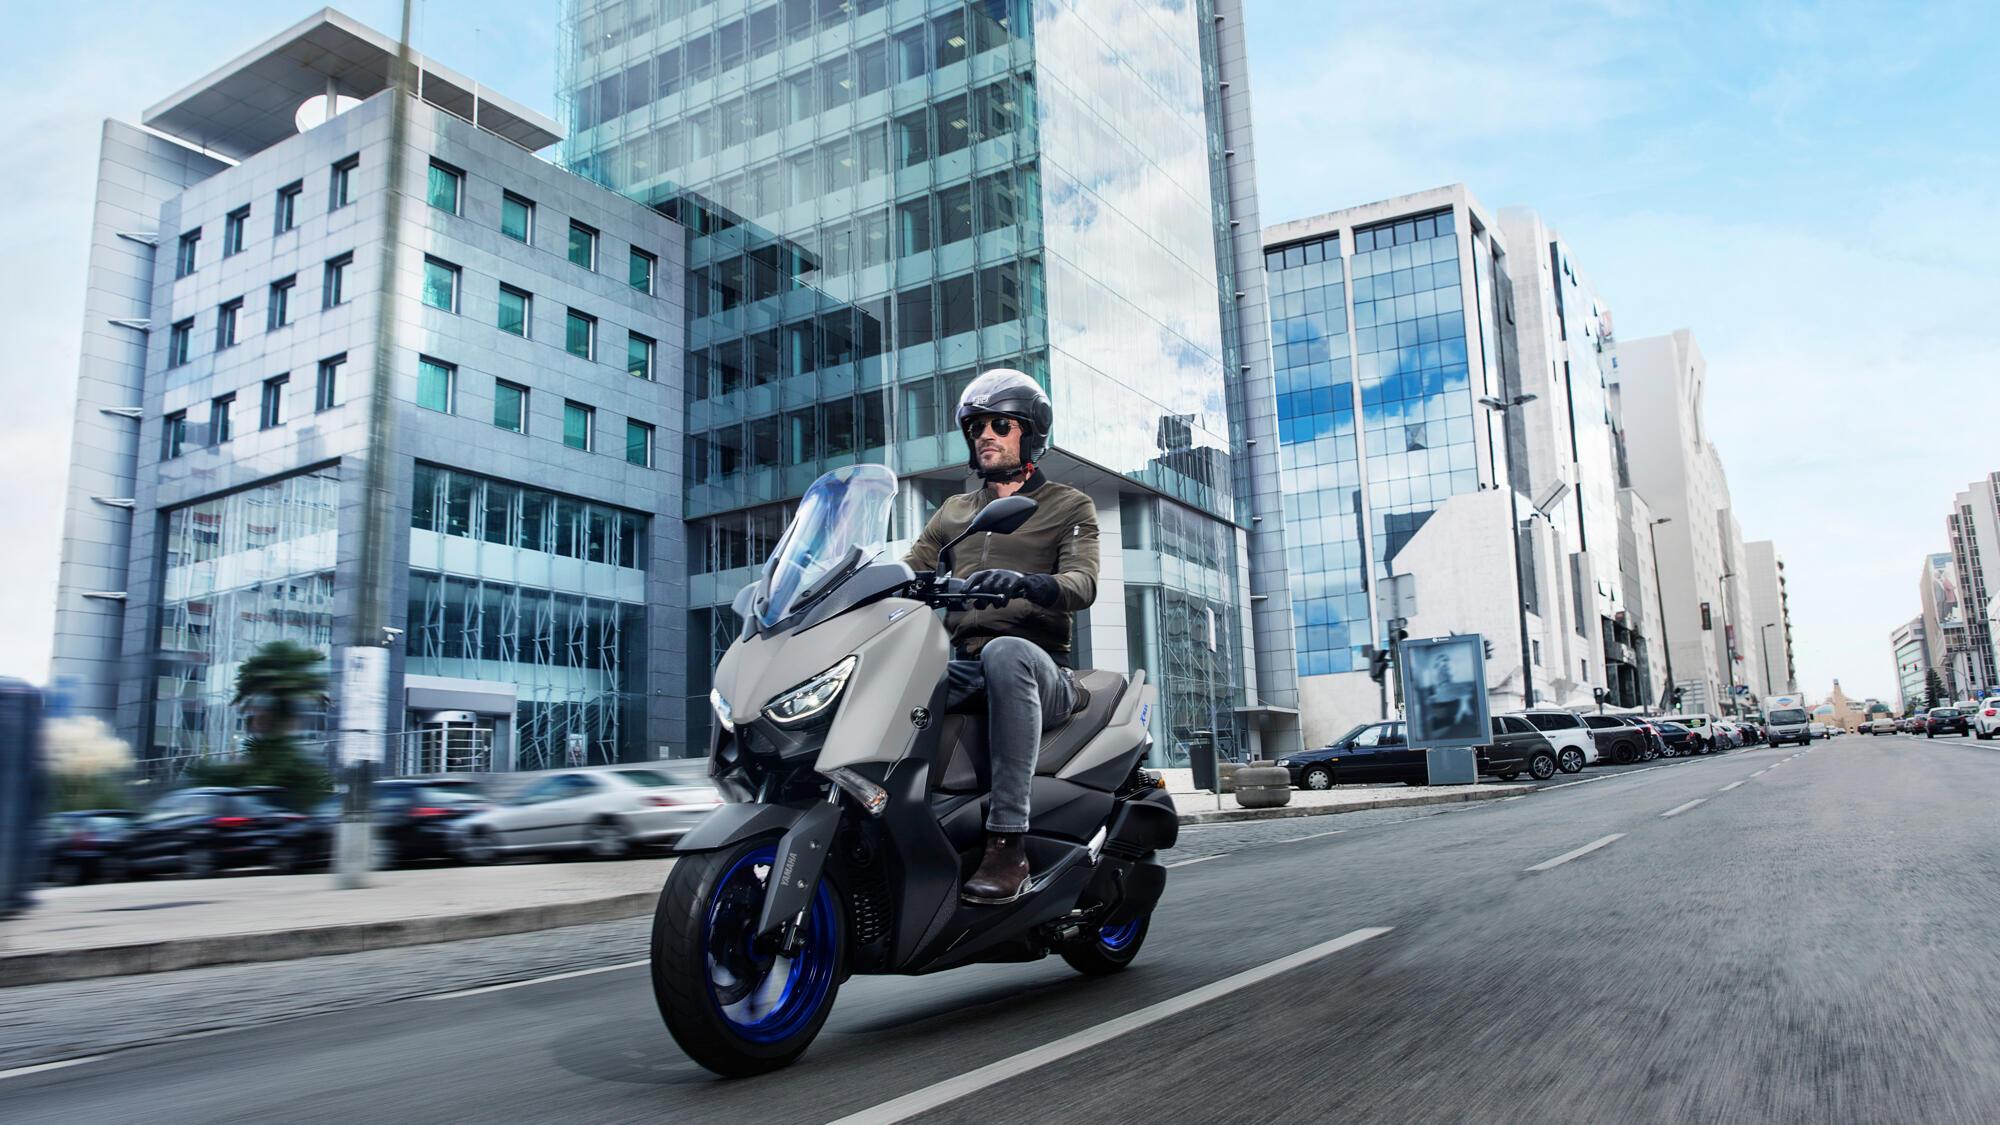 2021-Yamaha-XMAX300-EU-Icon_Grey-Action-002-03